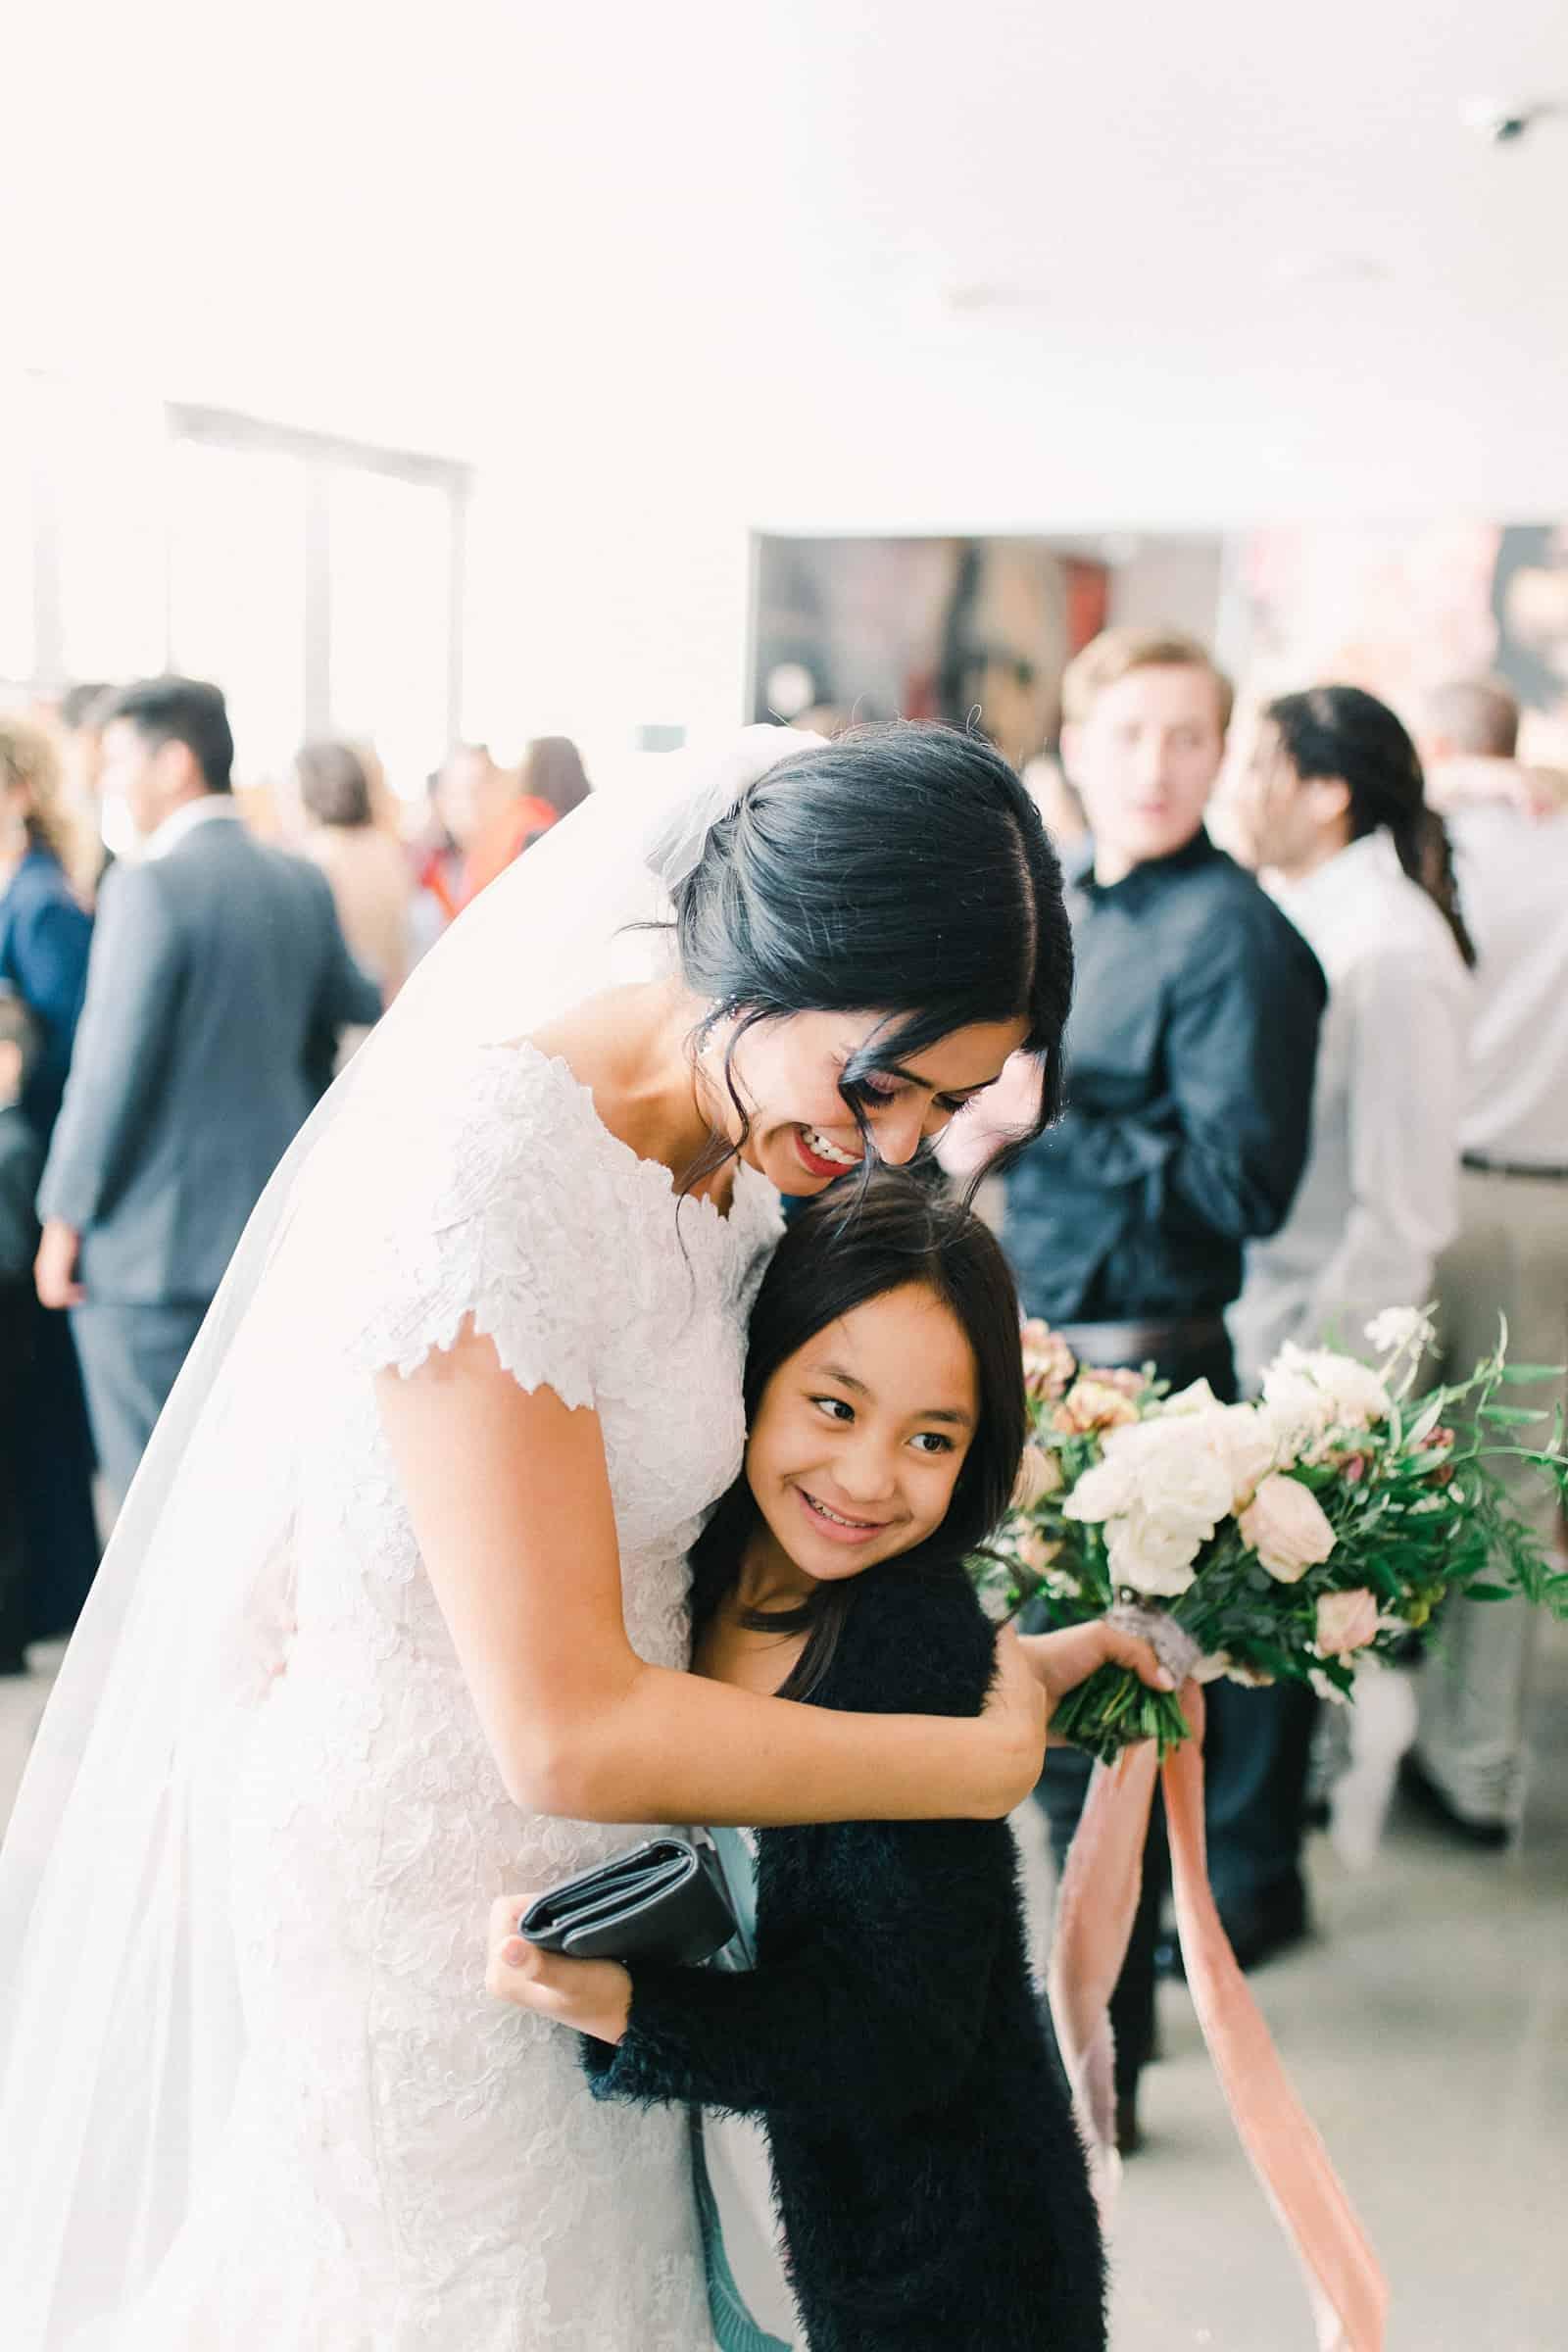 Bride hugs guest after wedding ceremony